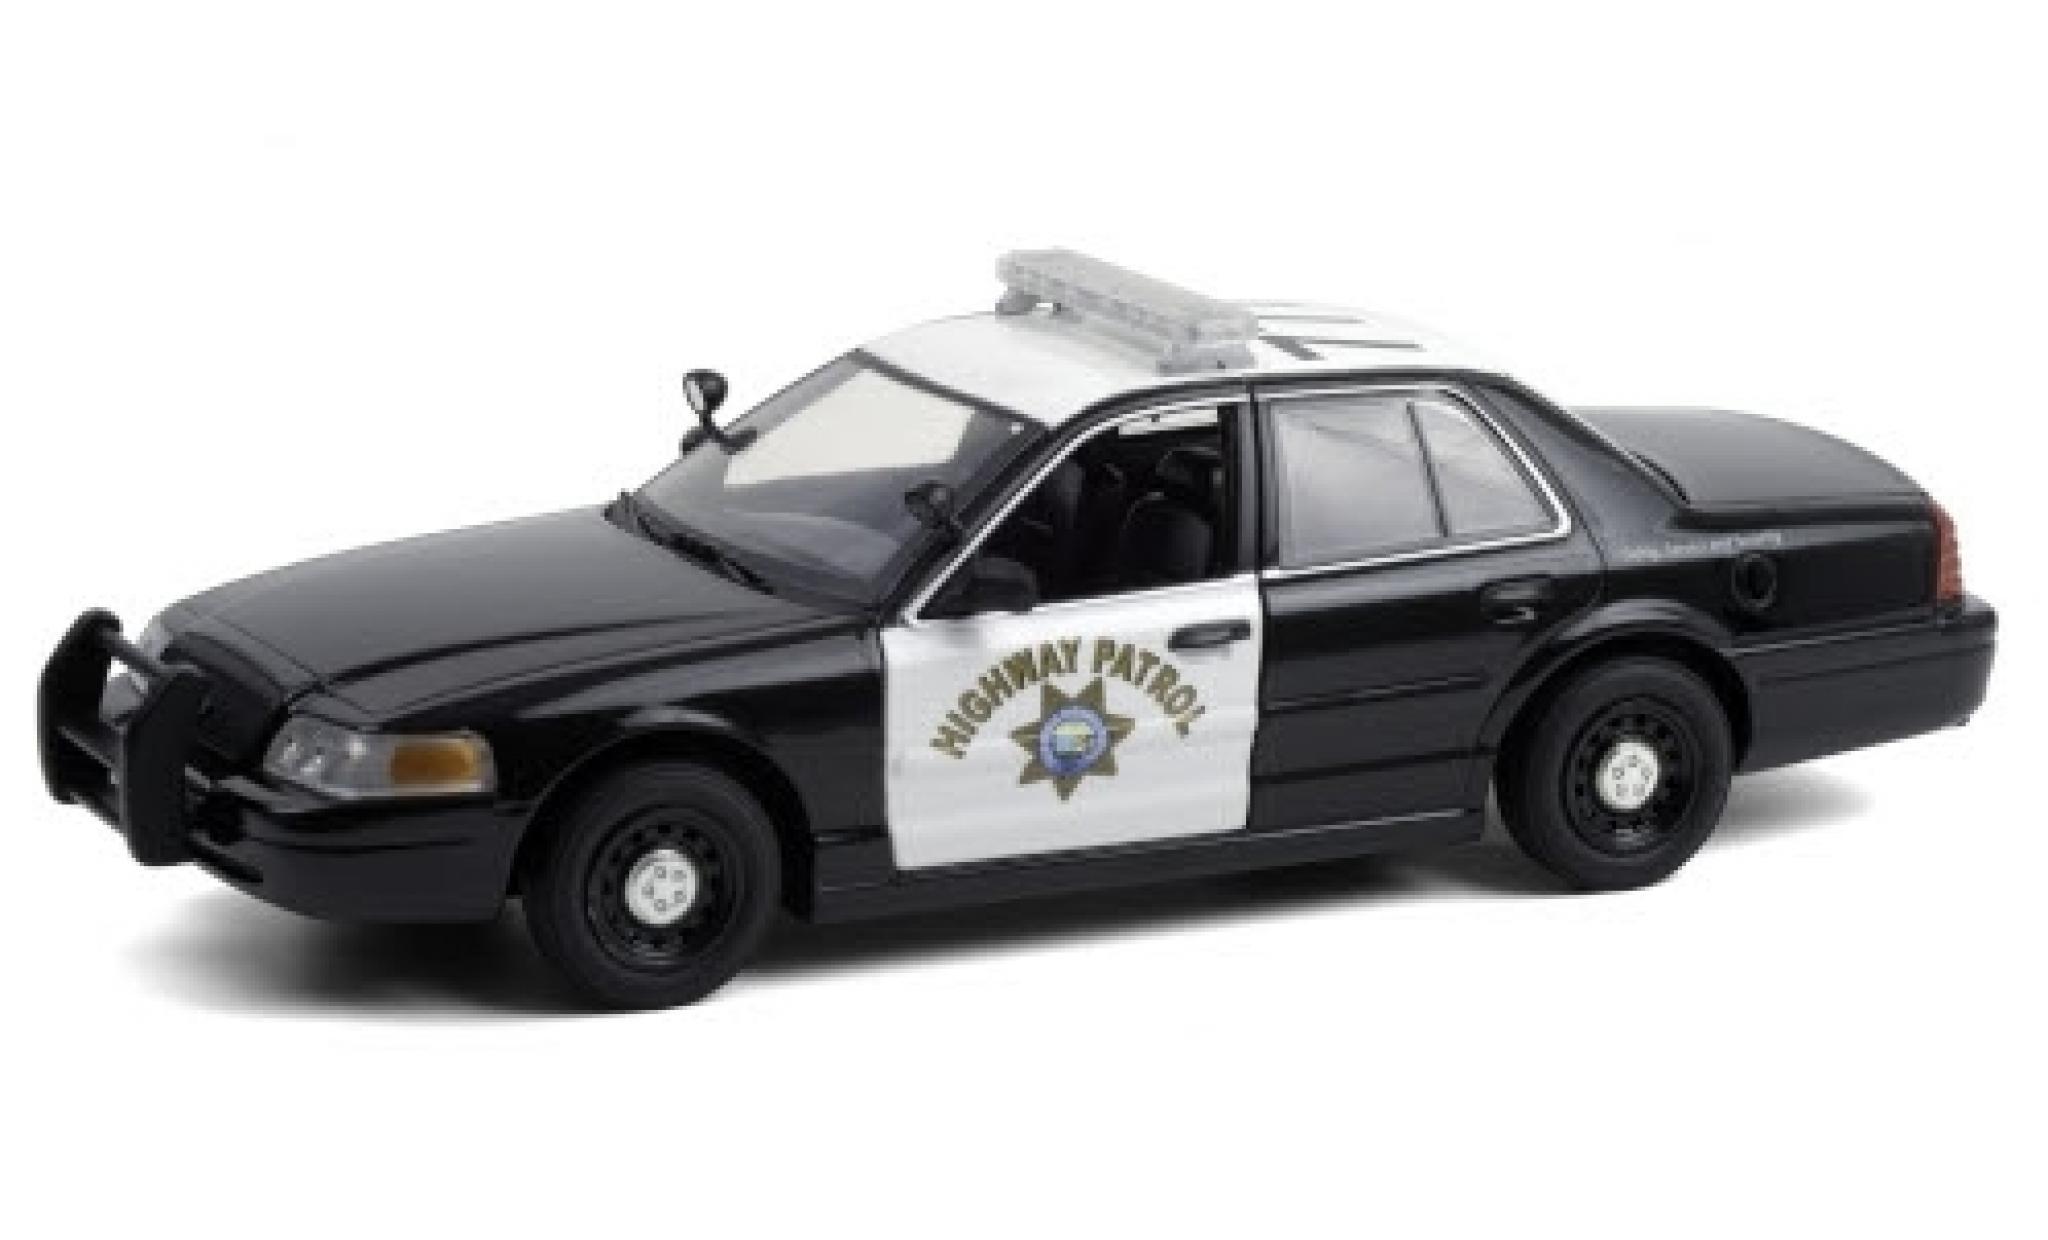 Ford Crown 1/24 Greenlight Victoria Police Interceptor California Highway Patrol 2008